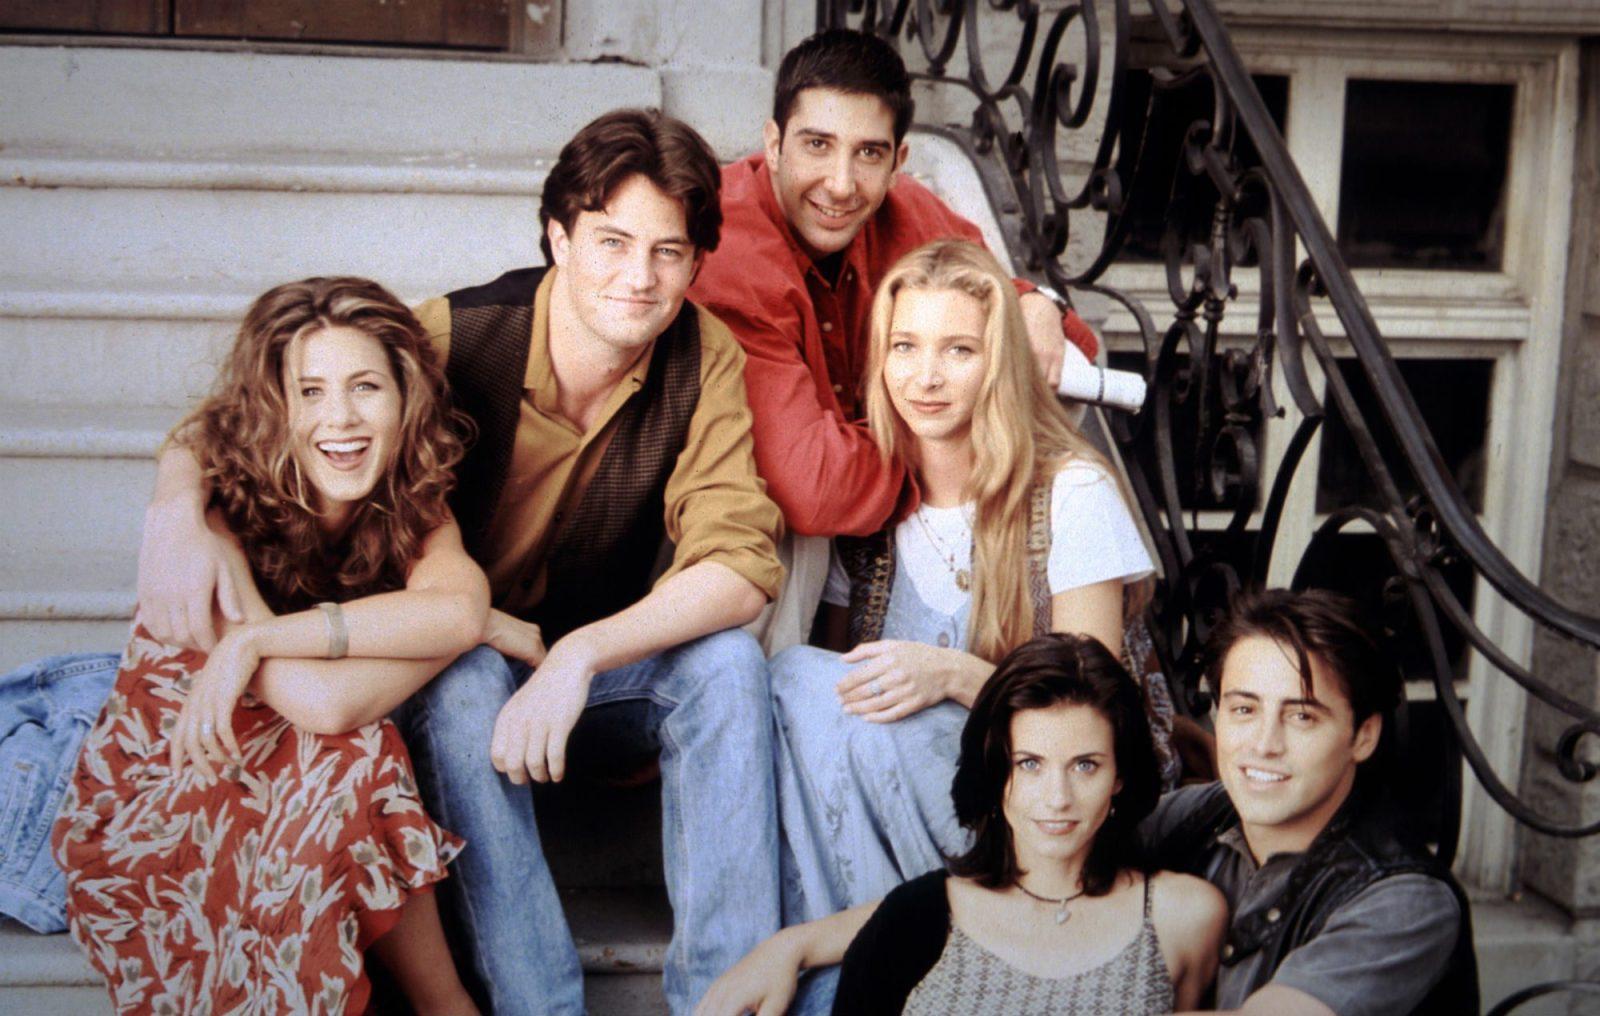 Friends Reunion: David Schwimmer Reveals When They Will Start Filming